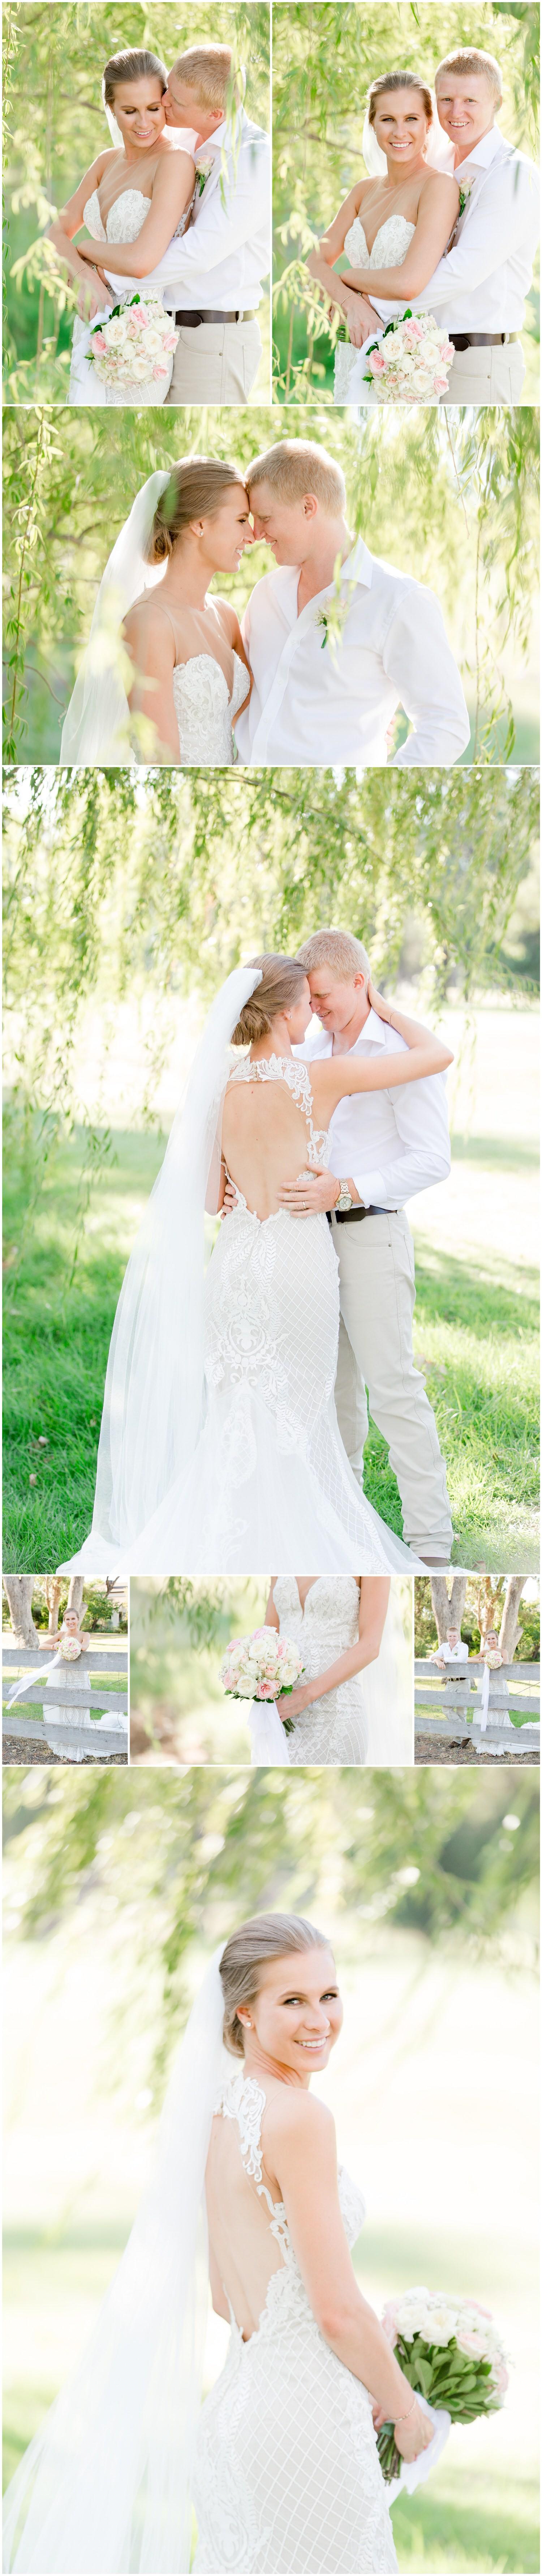 Dubbo Wedding Photography - Dubbo Golf Club Wedding 9